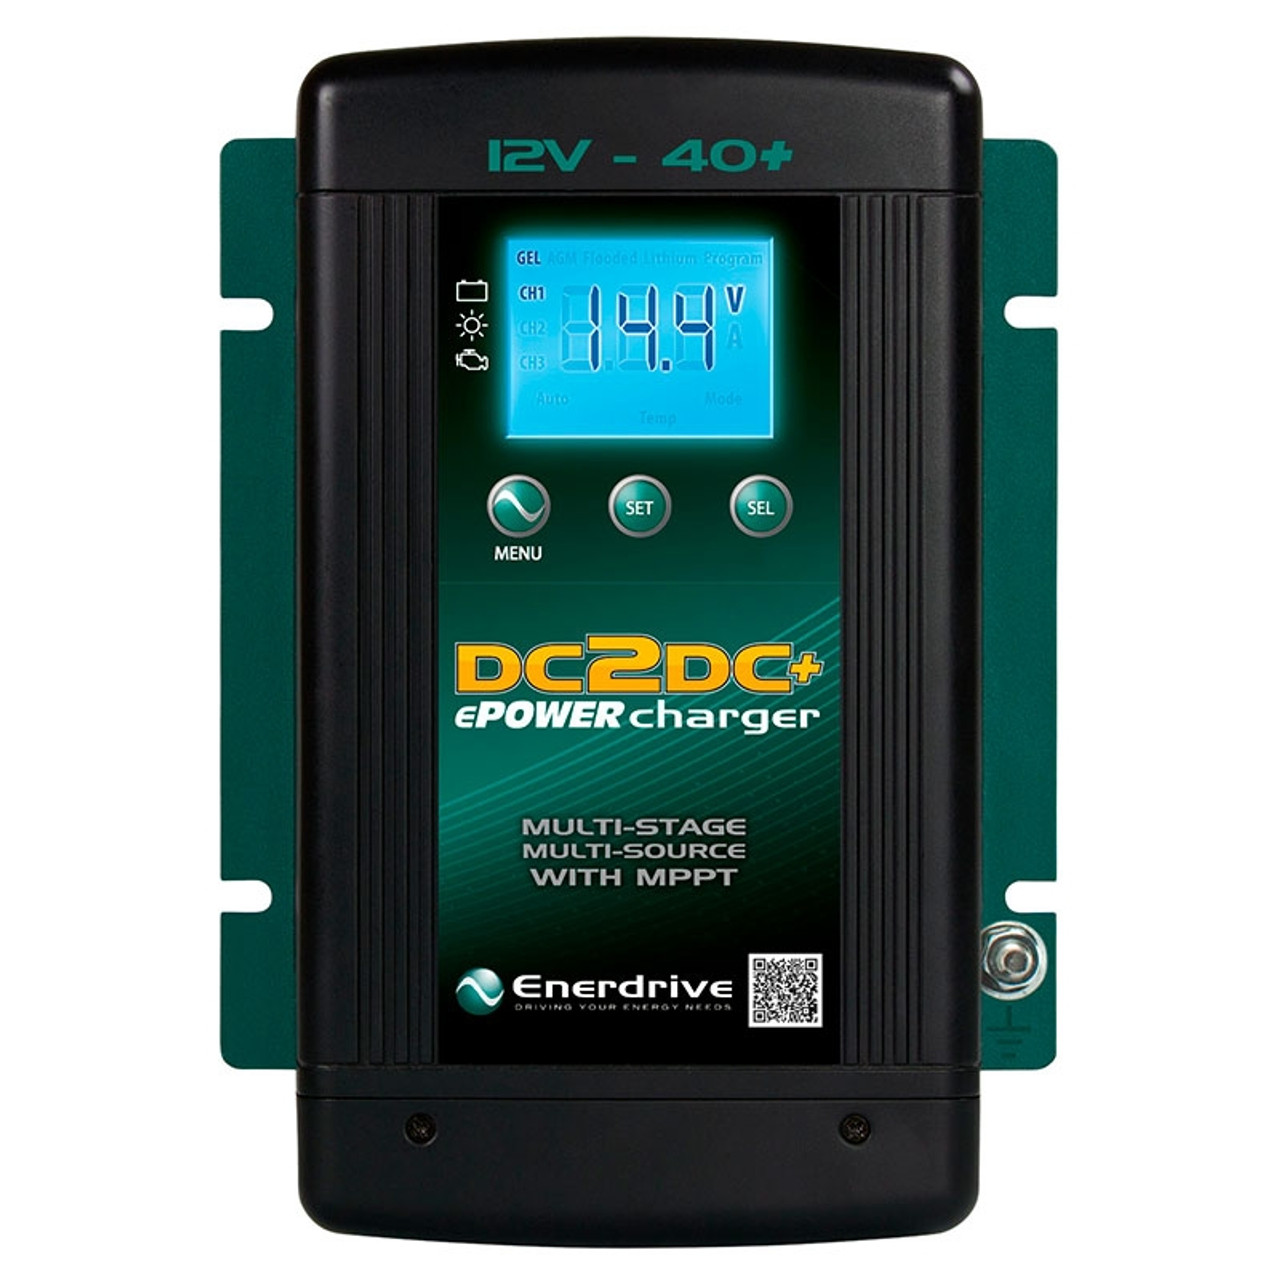 Enerdrive 12V 40A+ DC2DC Battery Charger (EN3DC40+)